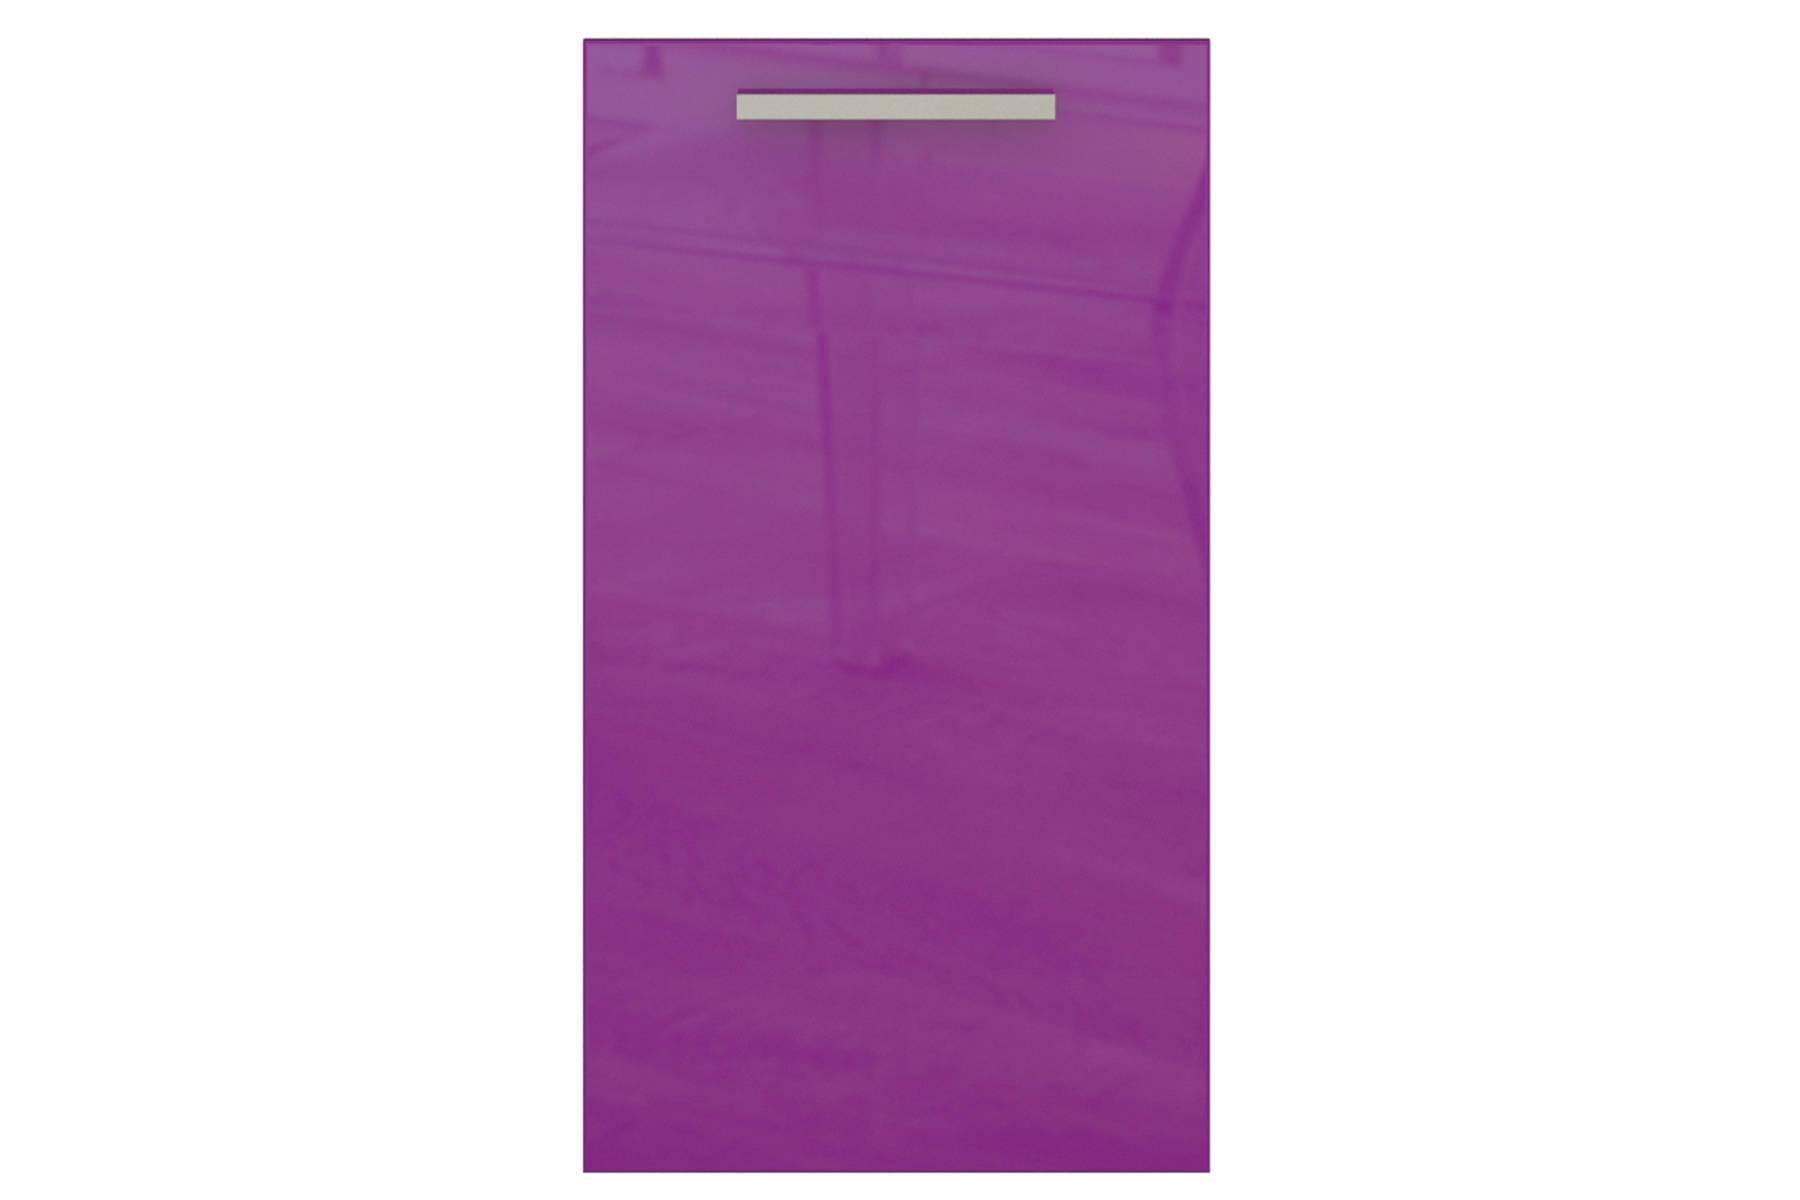 Фасад Хелена СТЛ.276.08 Фиолетовый глянец хелена роз свои правила